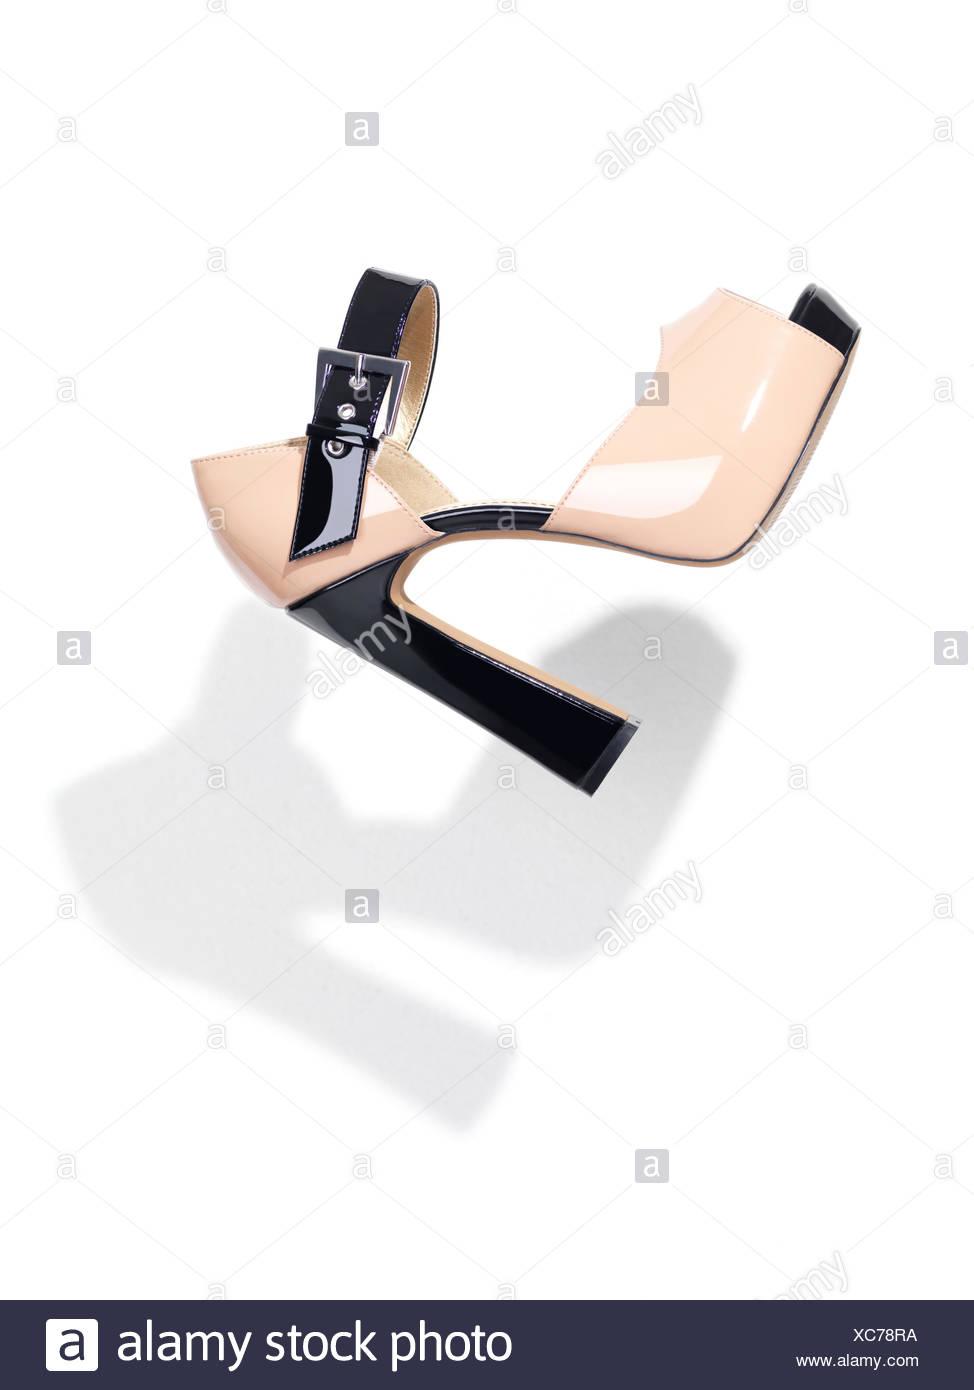 Shiny open-toe high heel shoe - Stock Image